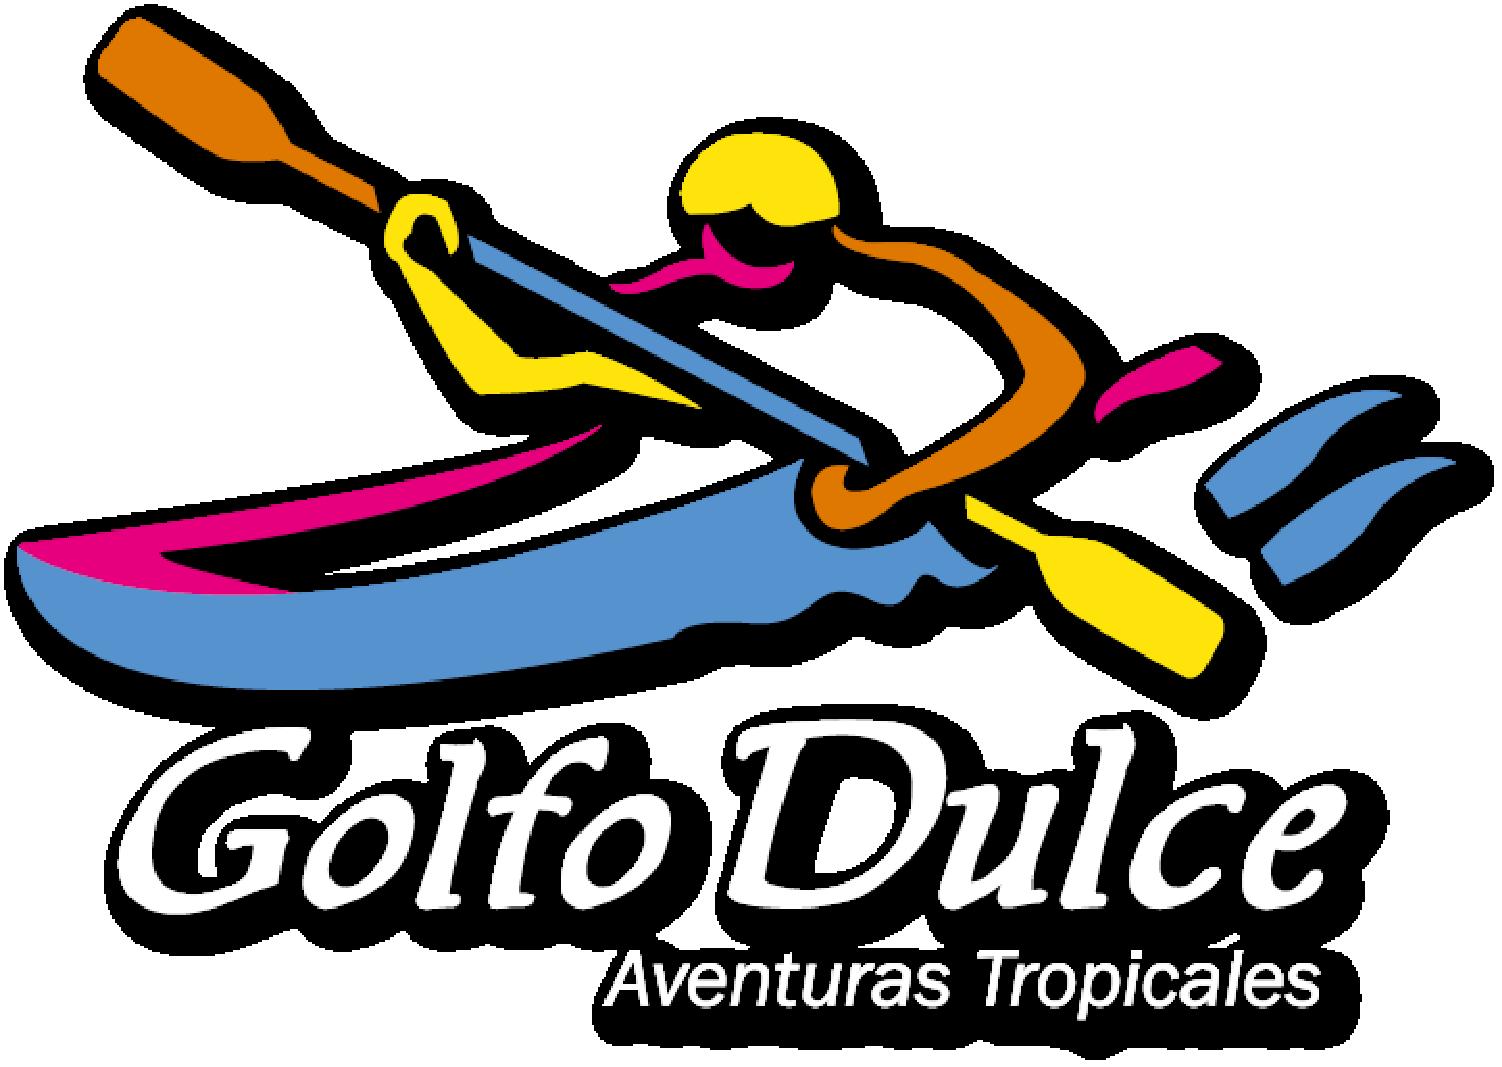 Aventuras Tropicales Golfo Dulce